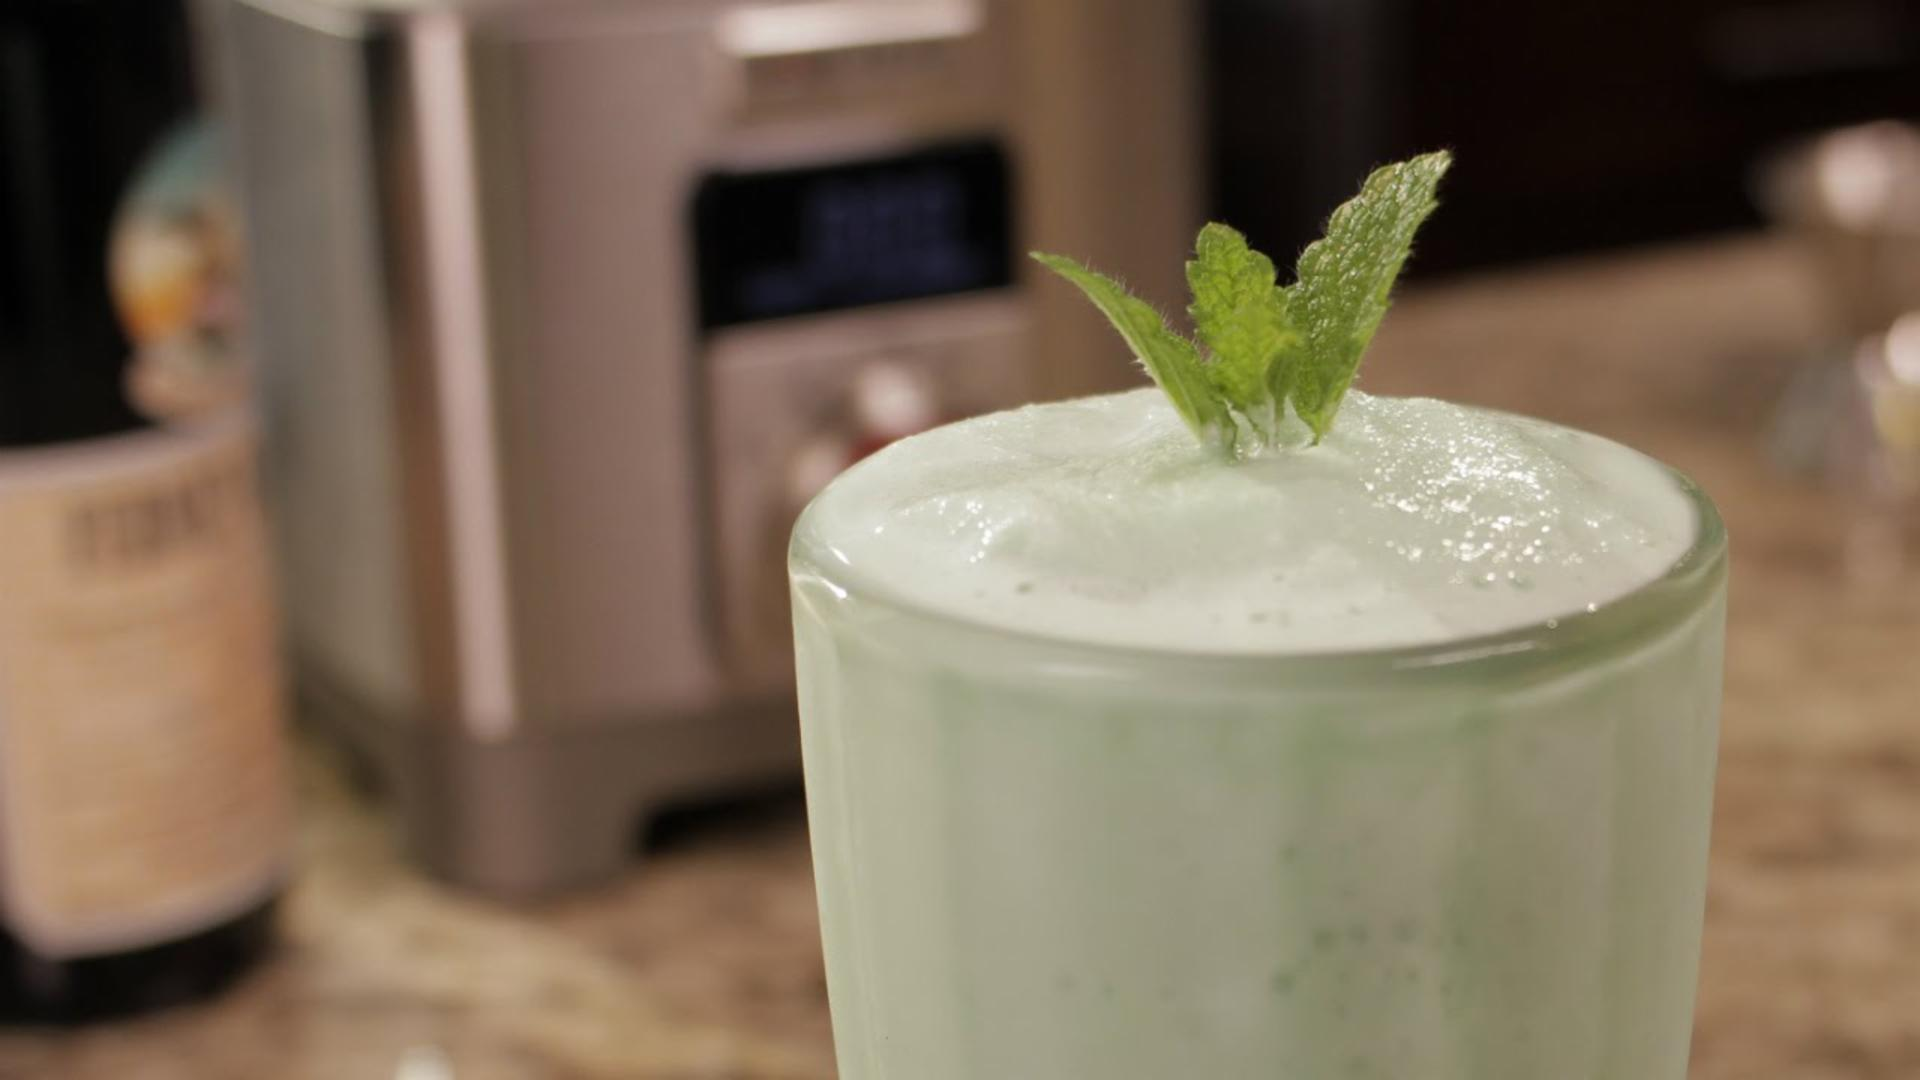 Grasshopper Recipe: The Morgenthaler Method